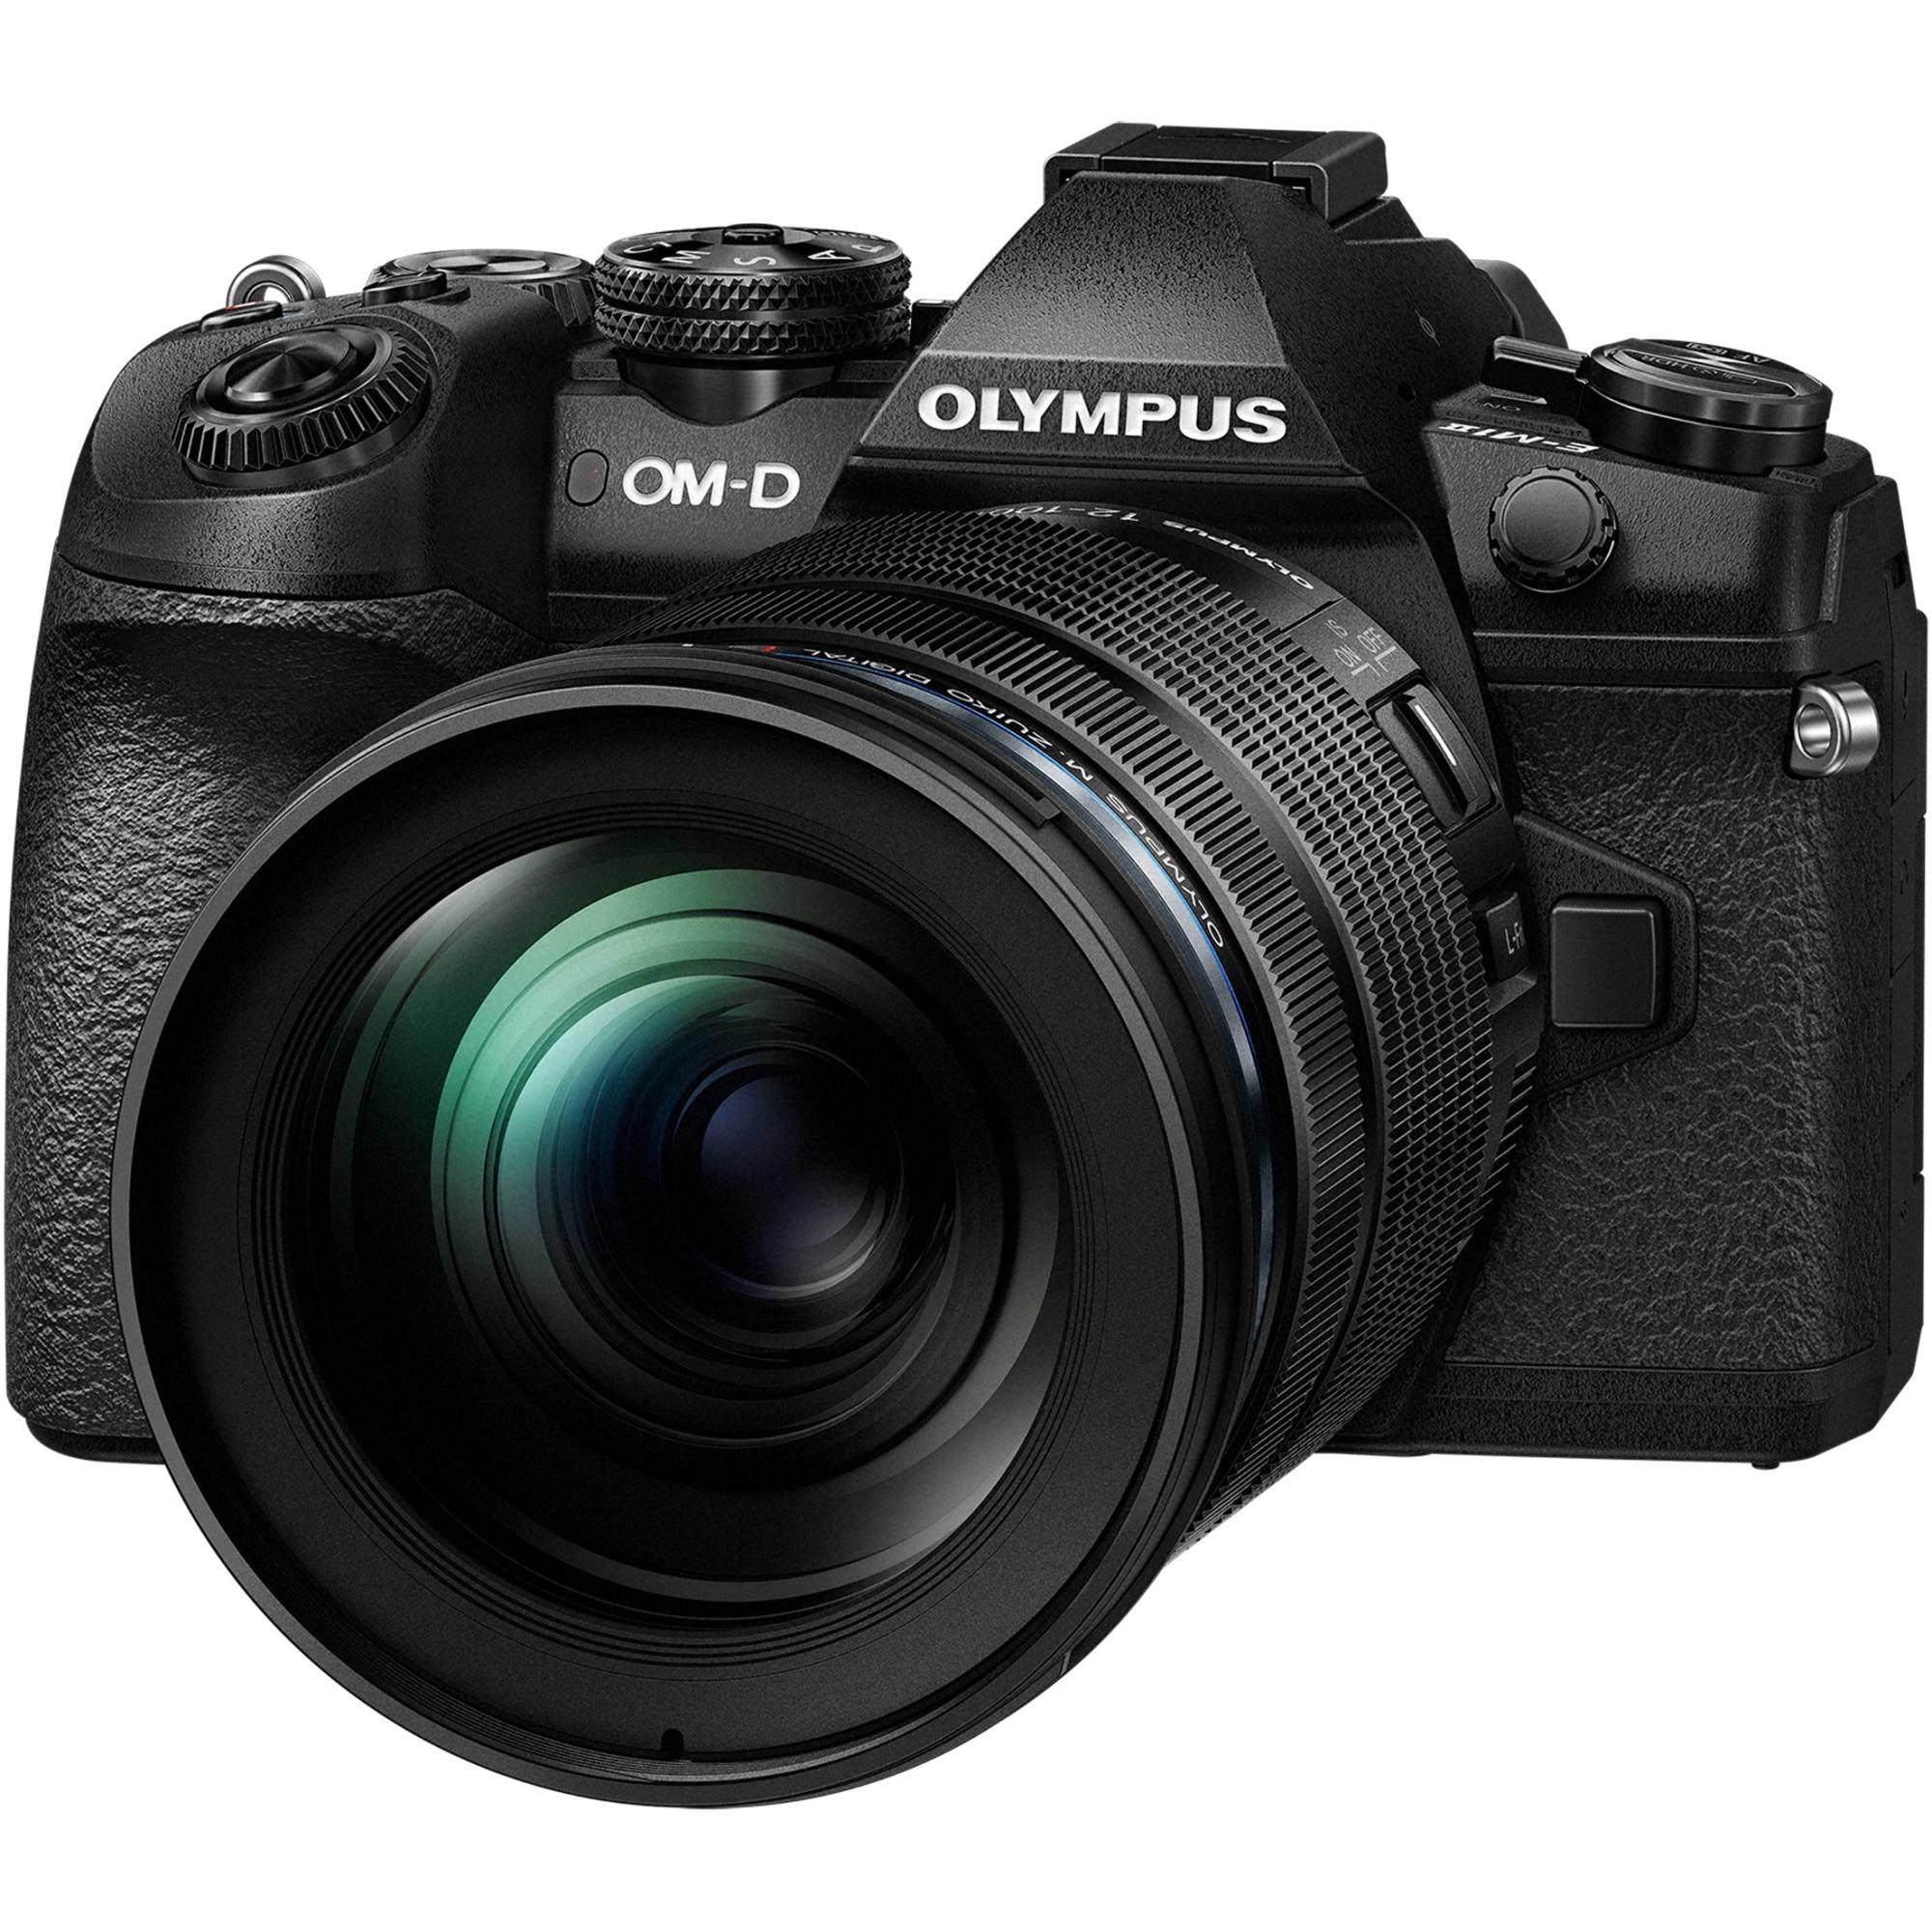 Fotografie Aparat foto Mirrorless Olympus E-M1 Mark II, 4K, Negru + Obiectiv 12-100mm F/4 PRO, Negru